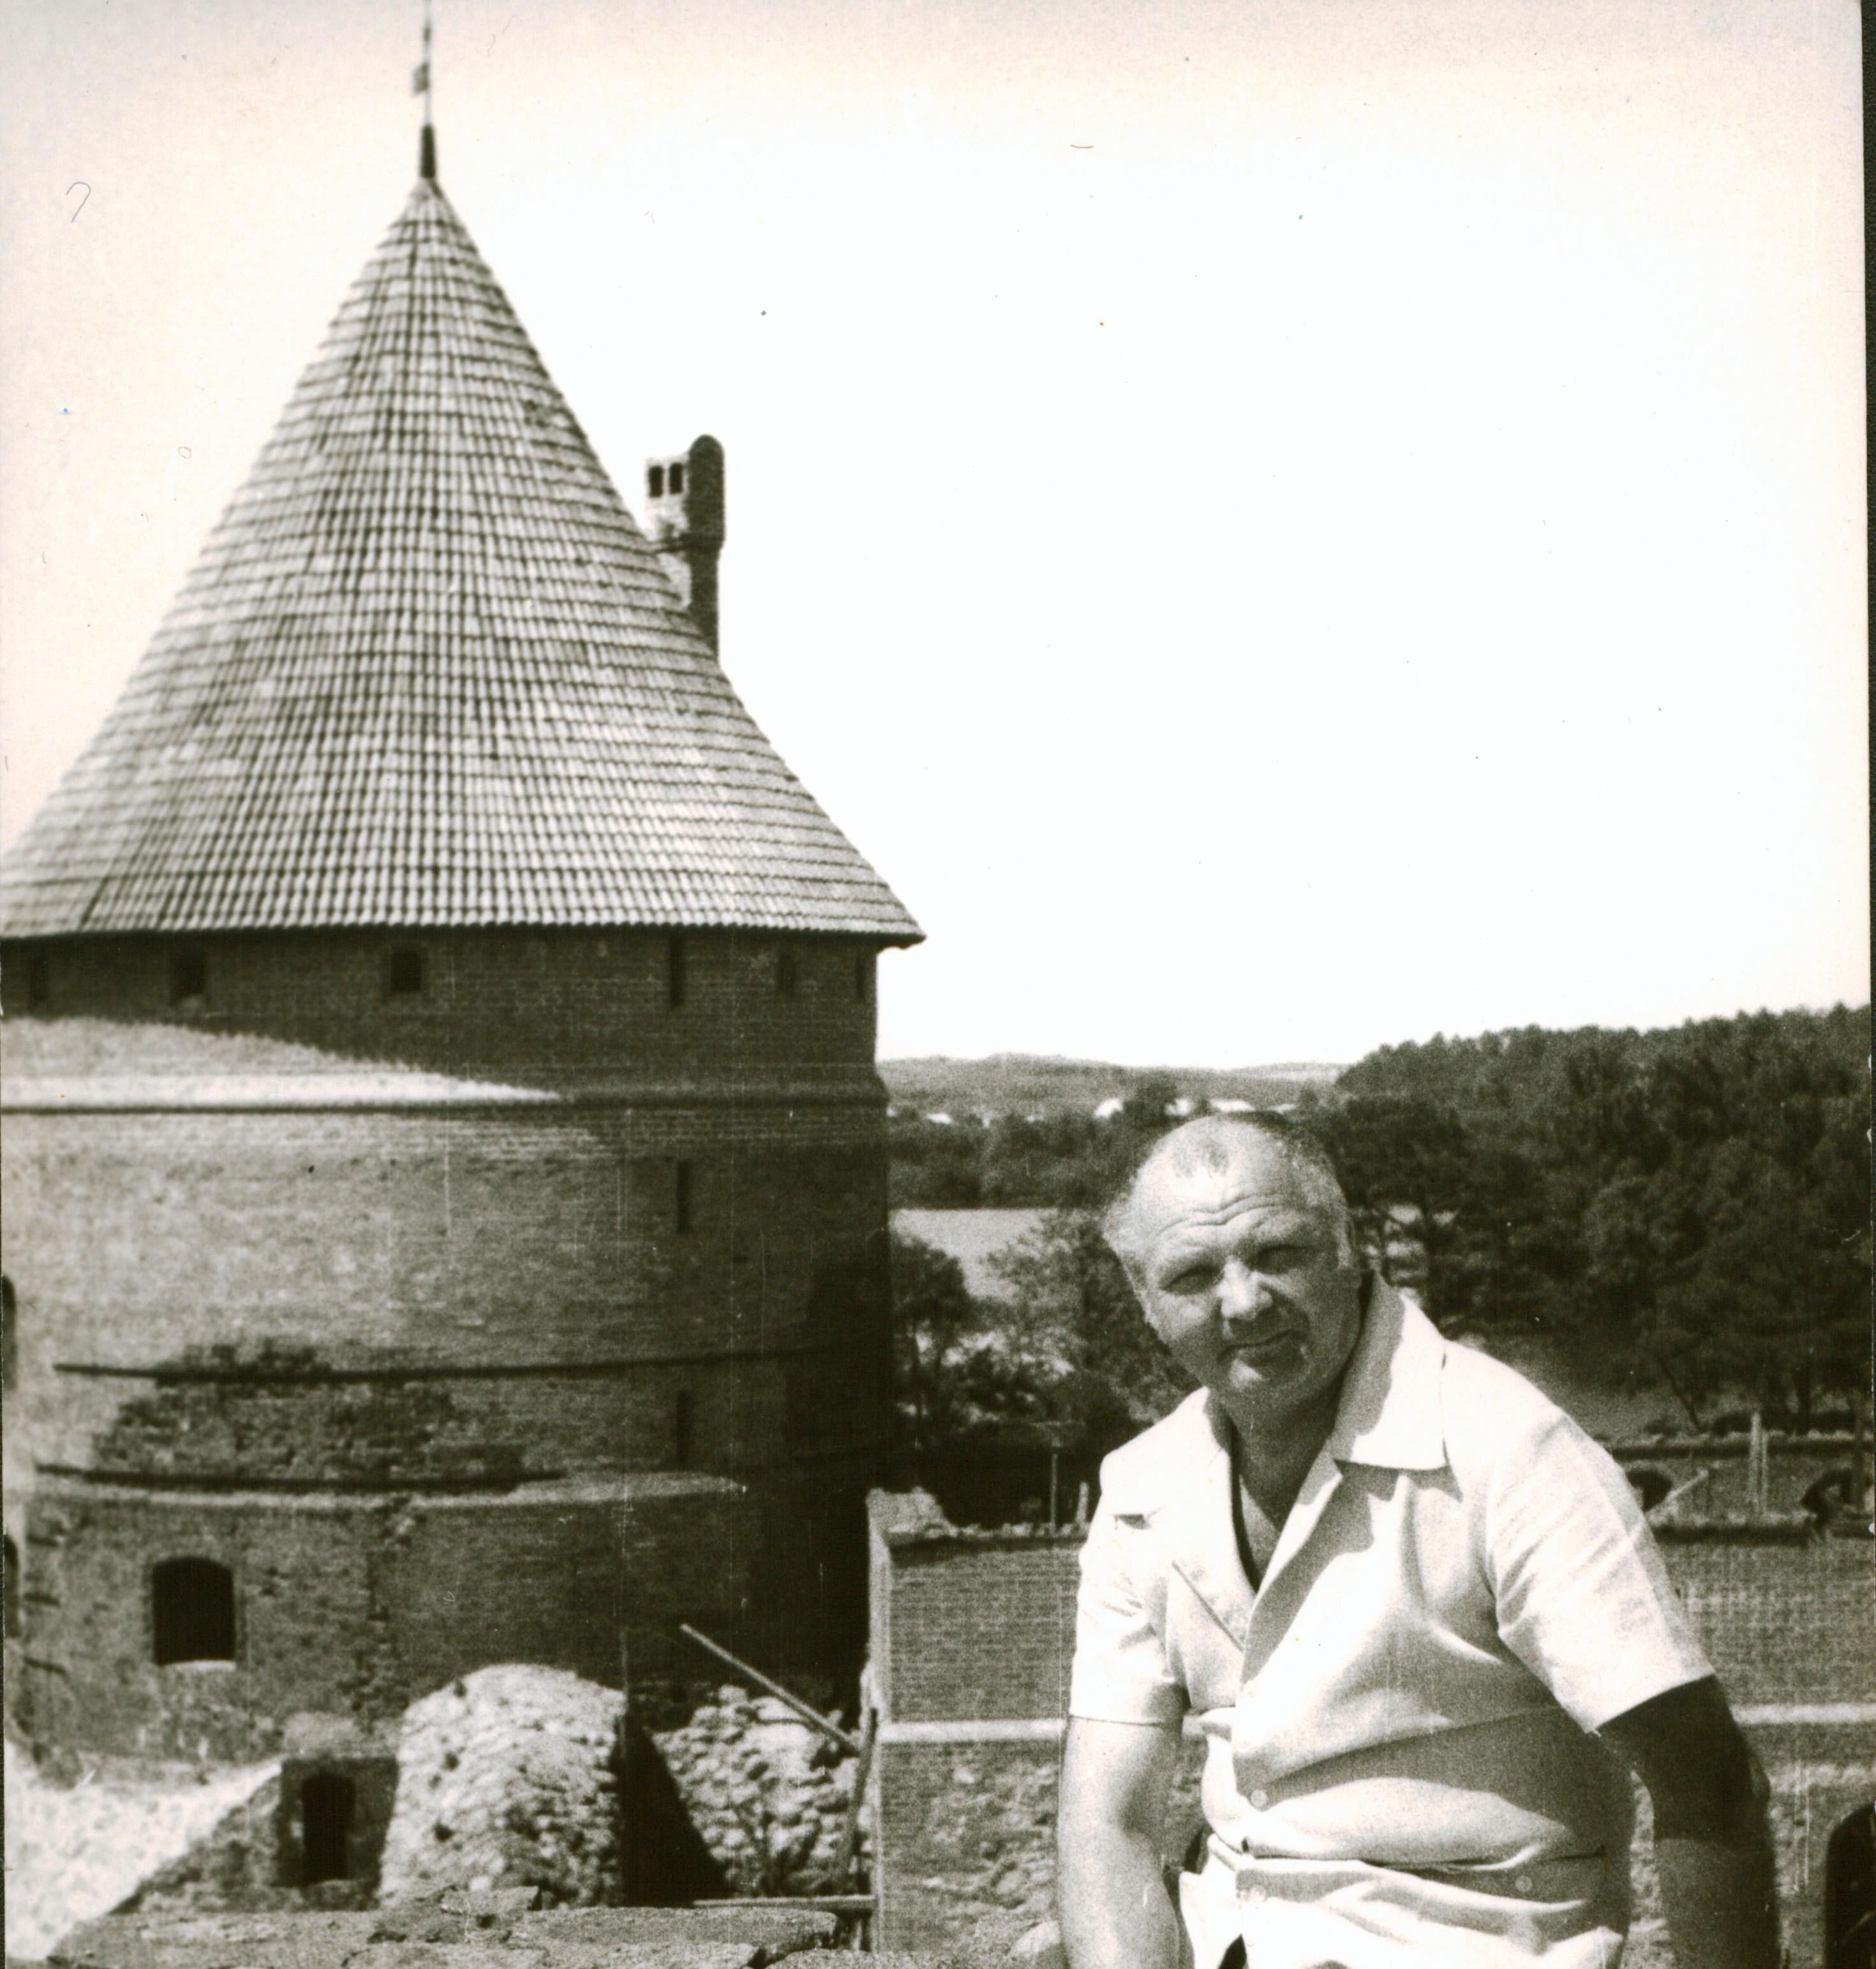 Stanislovas Mikulionis